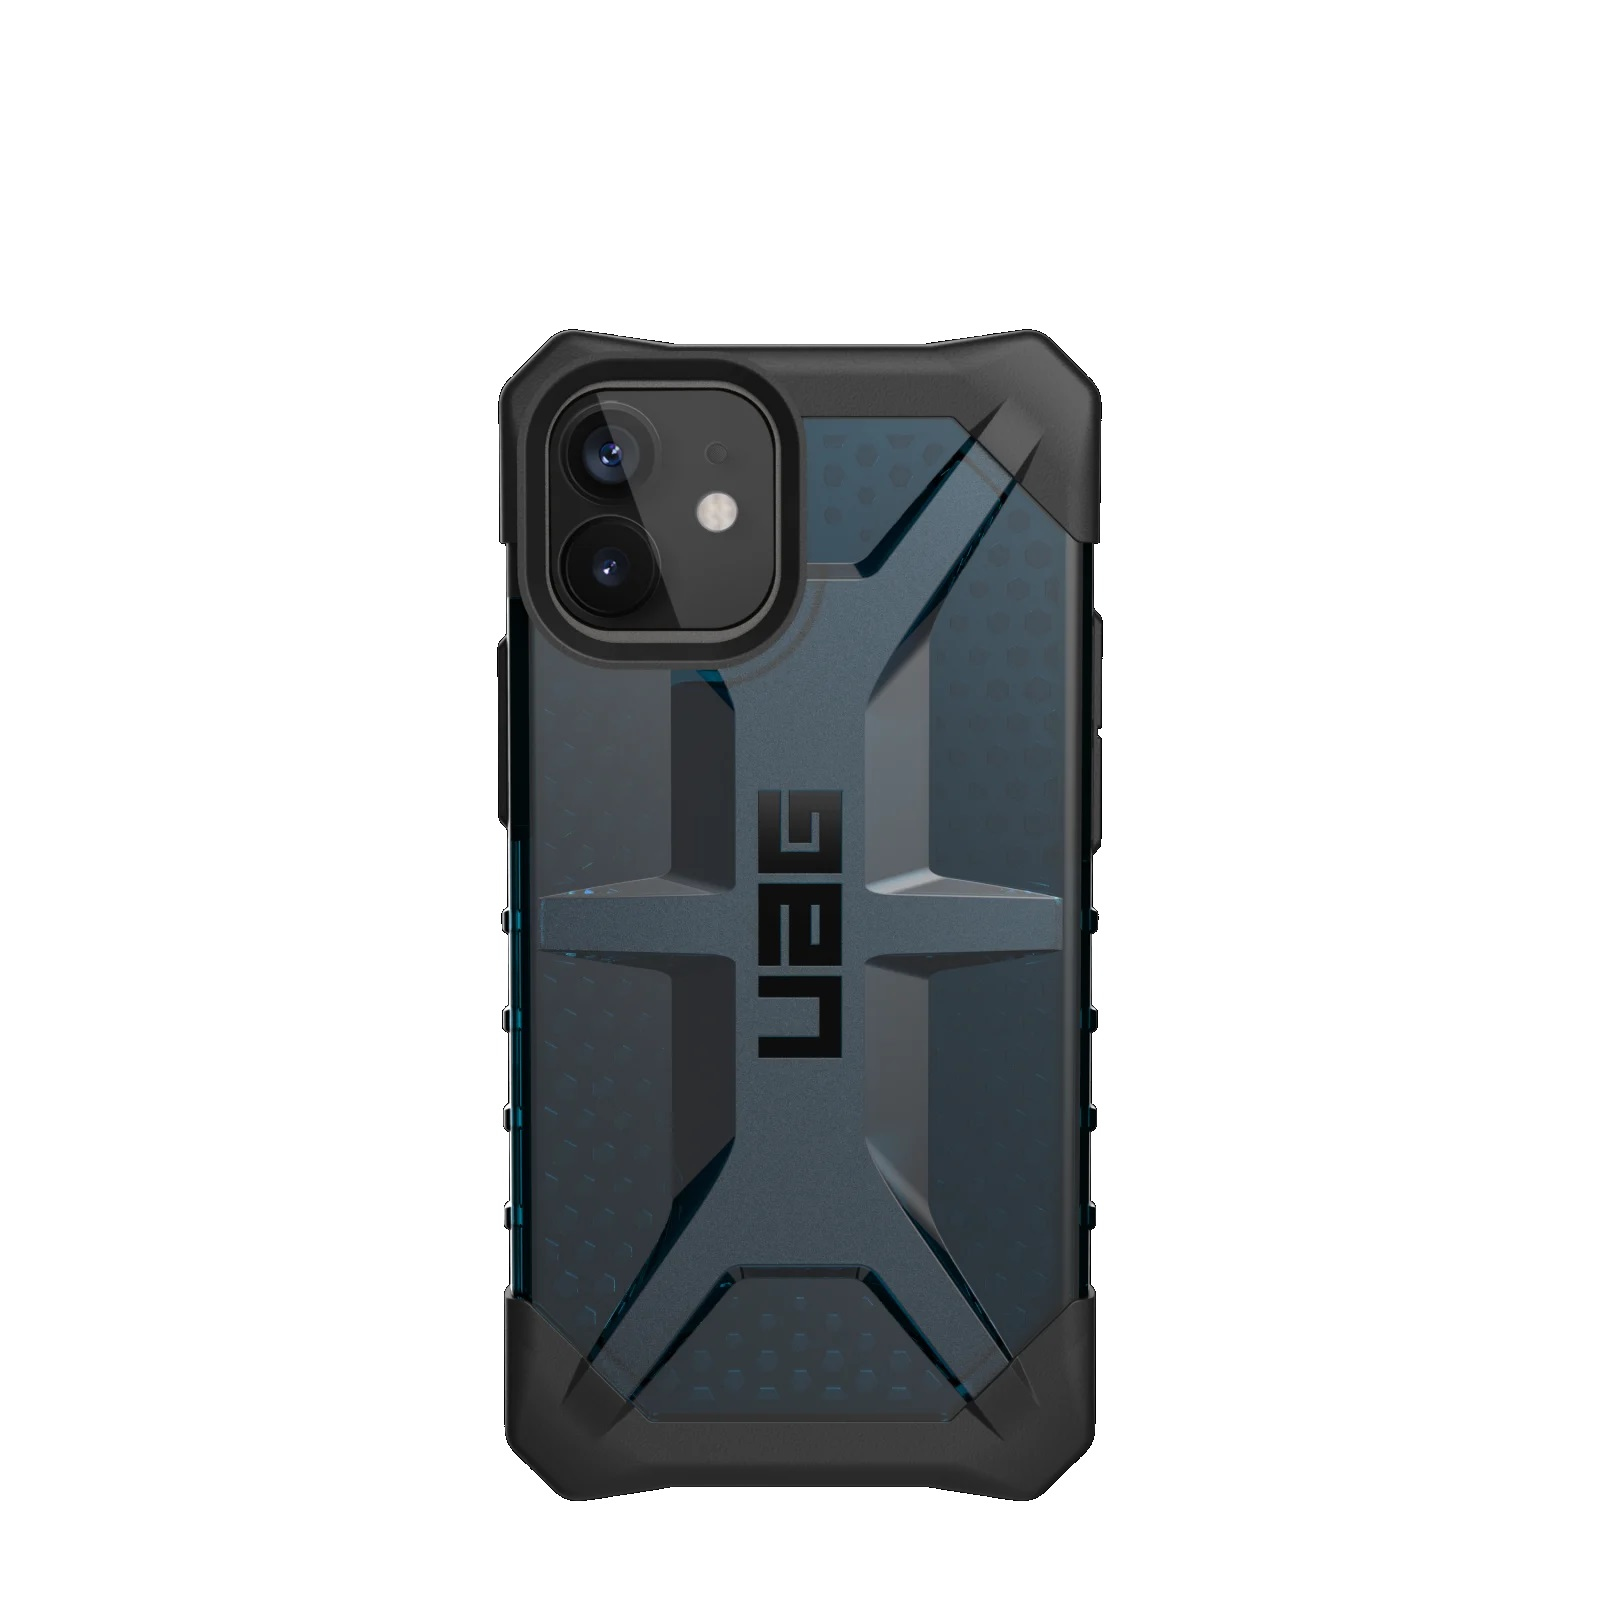 "Urban Armor Gear Plasma funda para teléfono móvil 13,7 cm (5.4"") Negro, Azul, Translúcido"